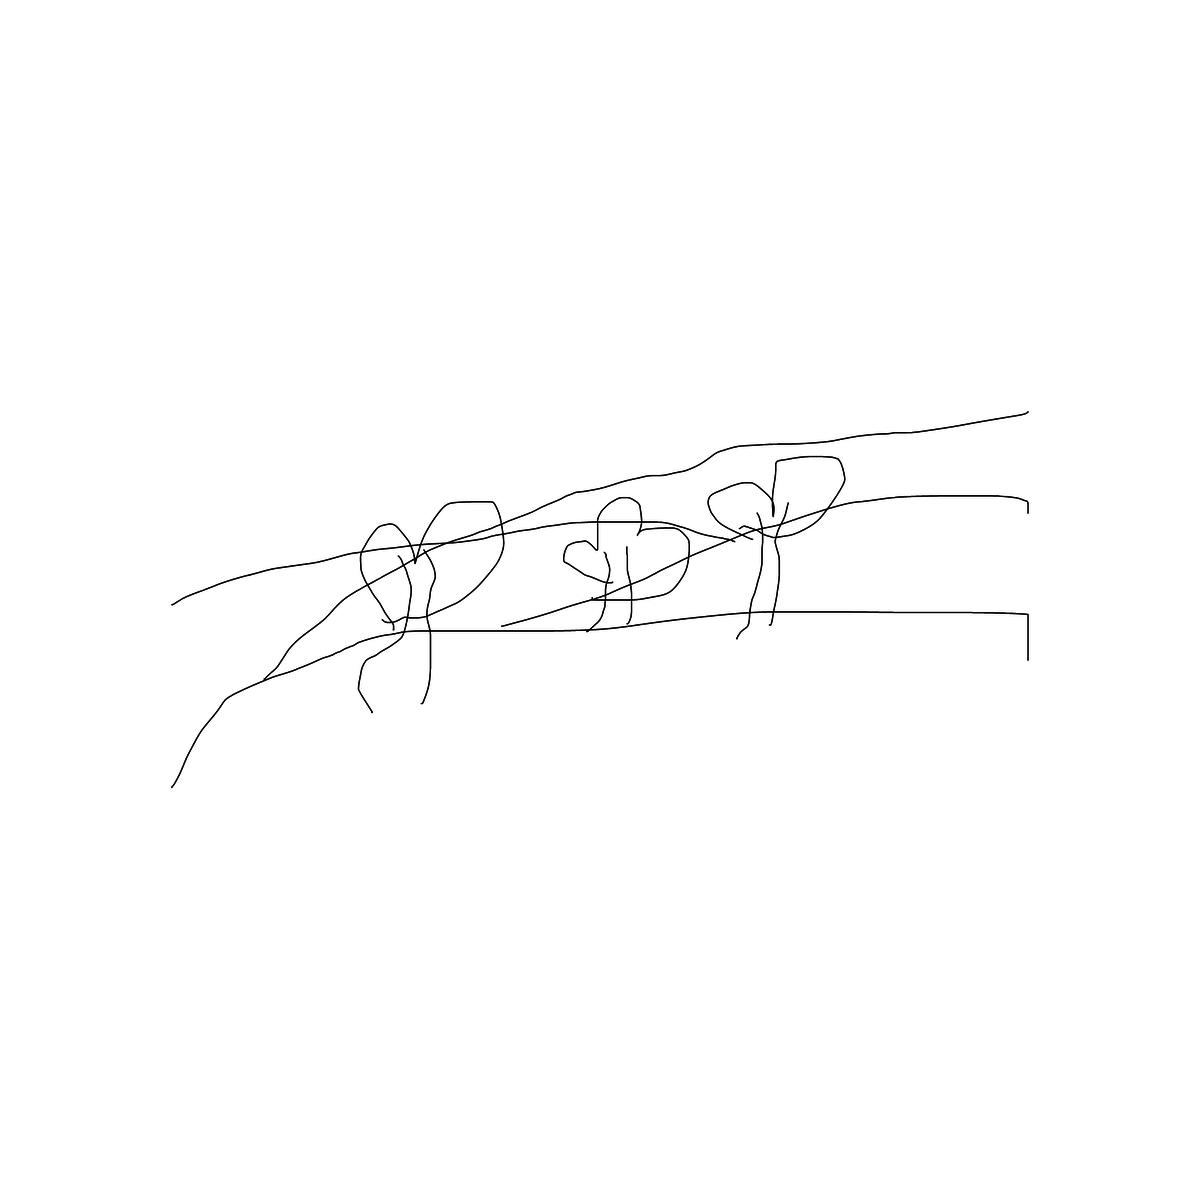 BAAAM drawing#5393 lat:54.8667297363281250lng: -7.0772552490234375